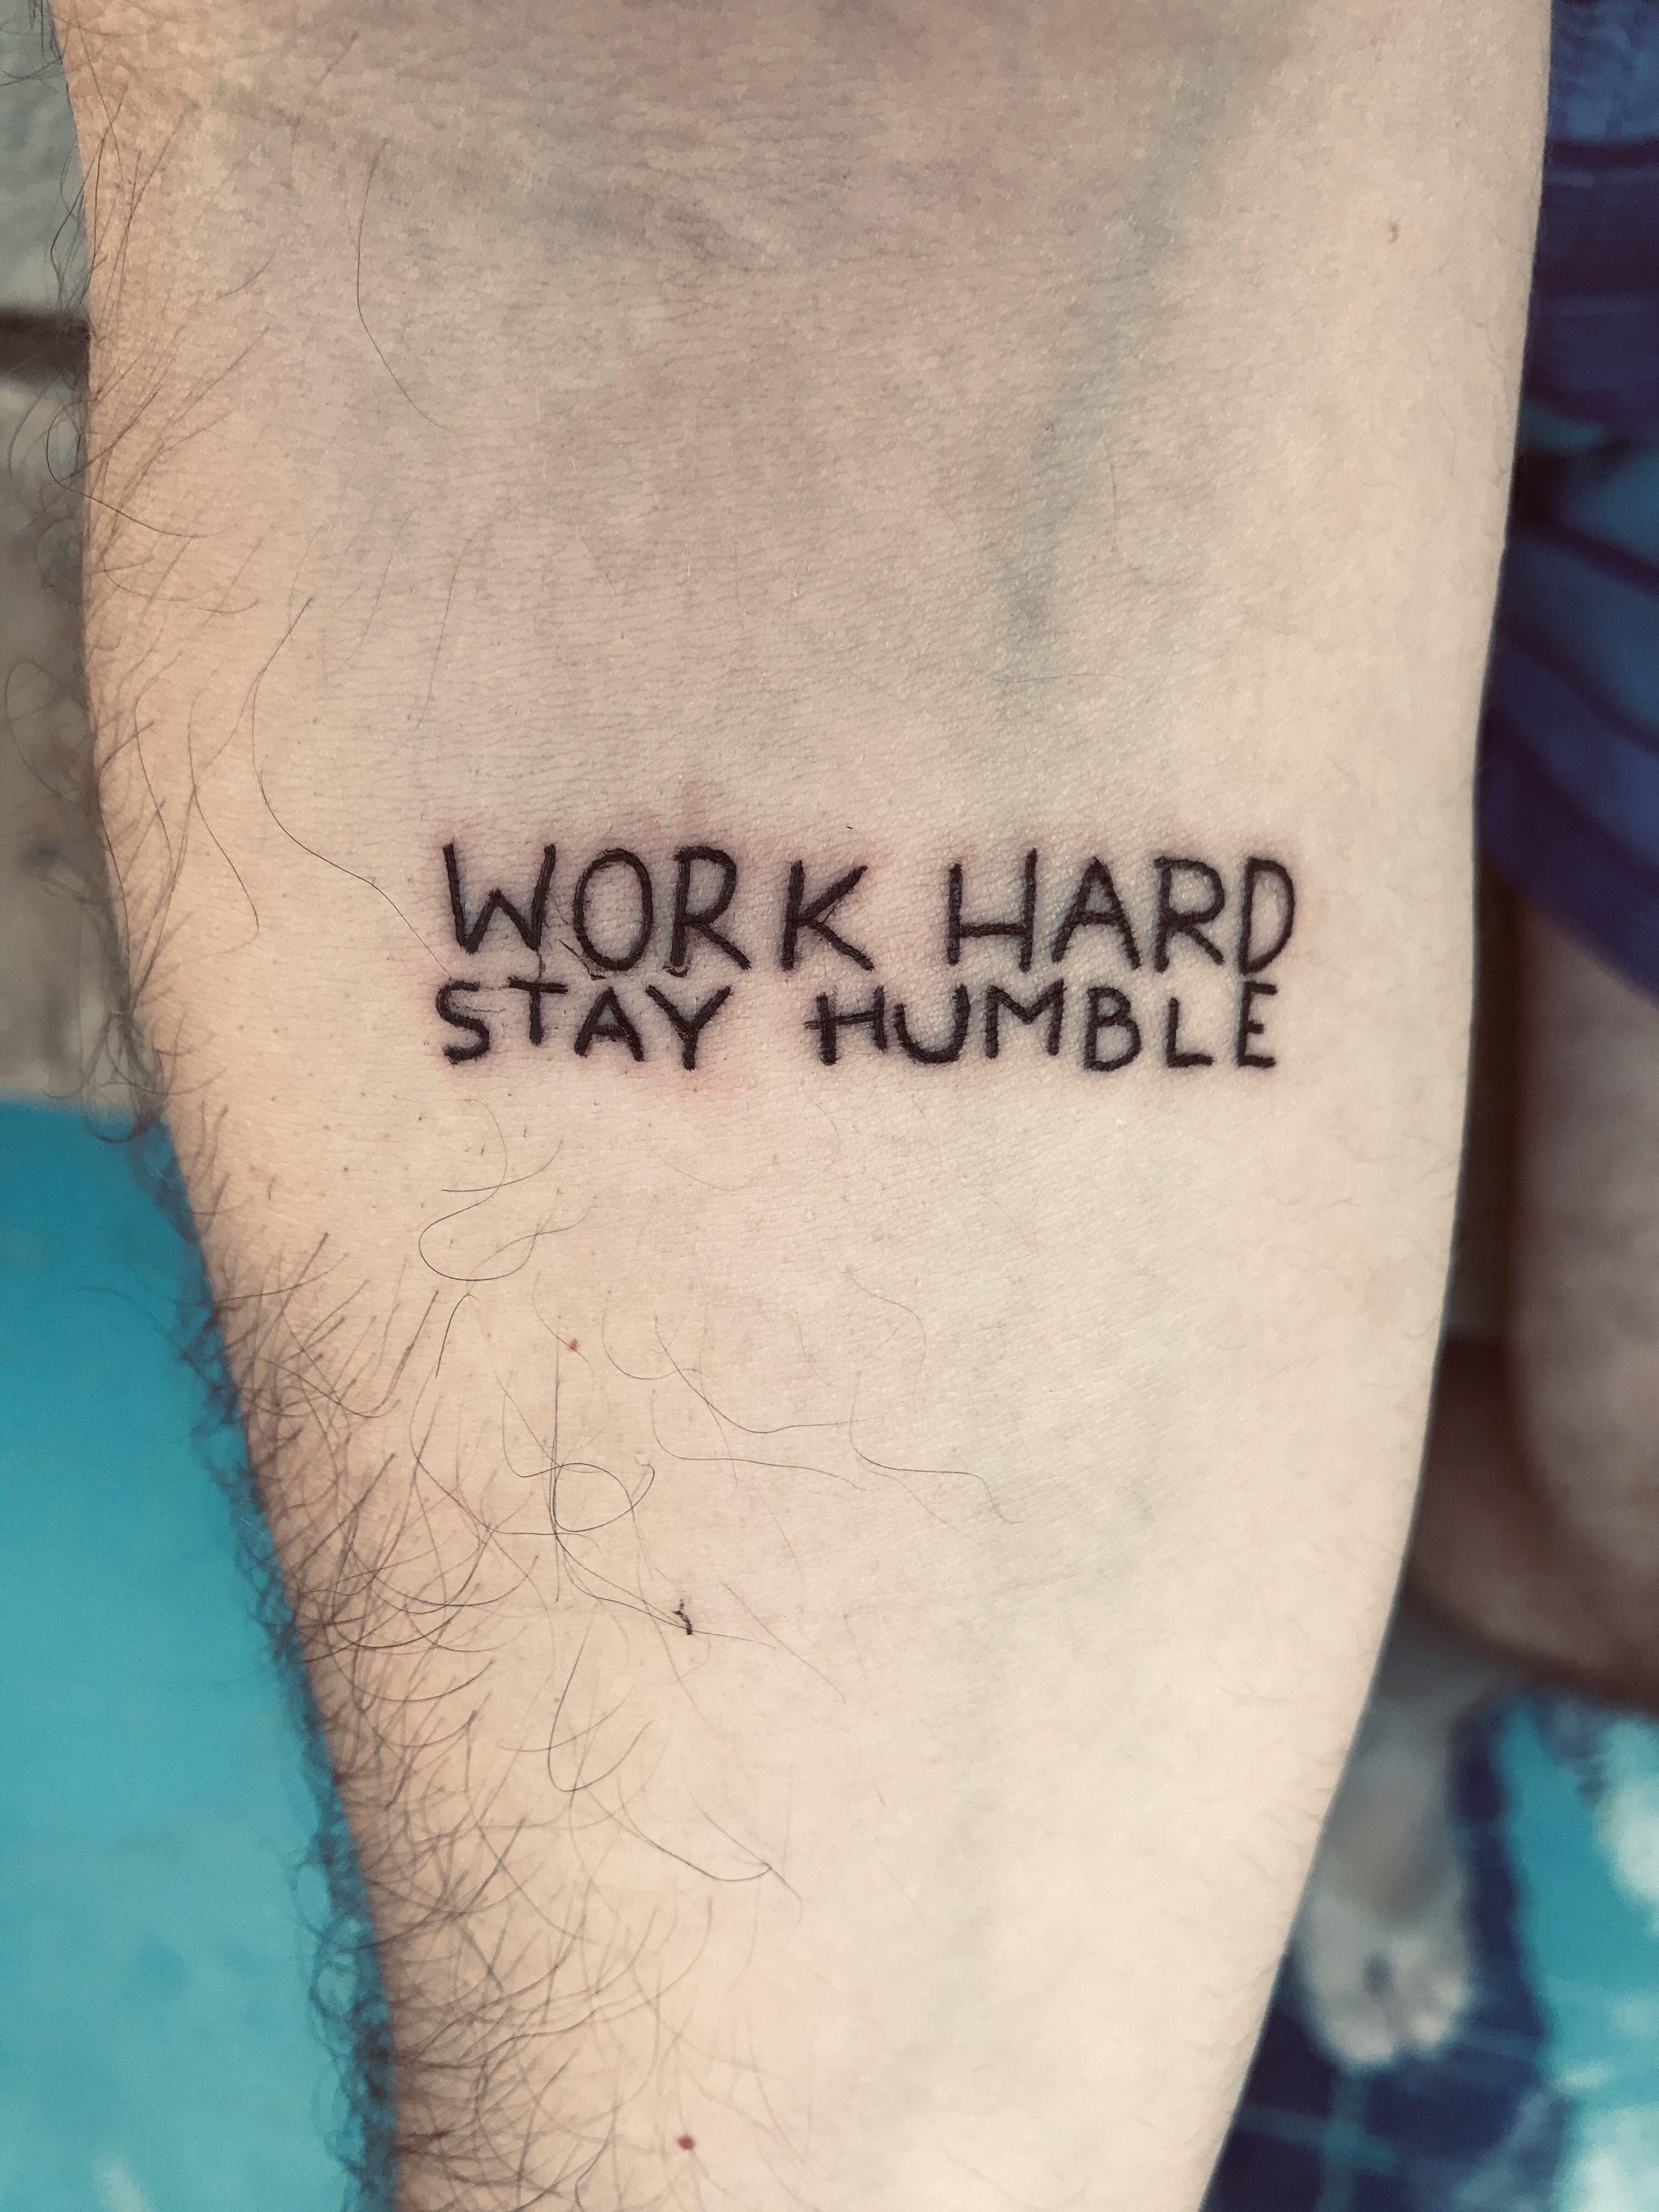 Tattoo Work Hard Stay Humble Work Hard Stay Humble Stay Humble Tattoo Humble Tattoo